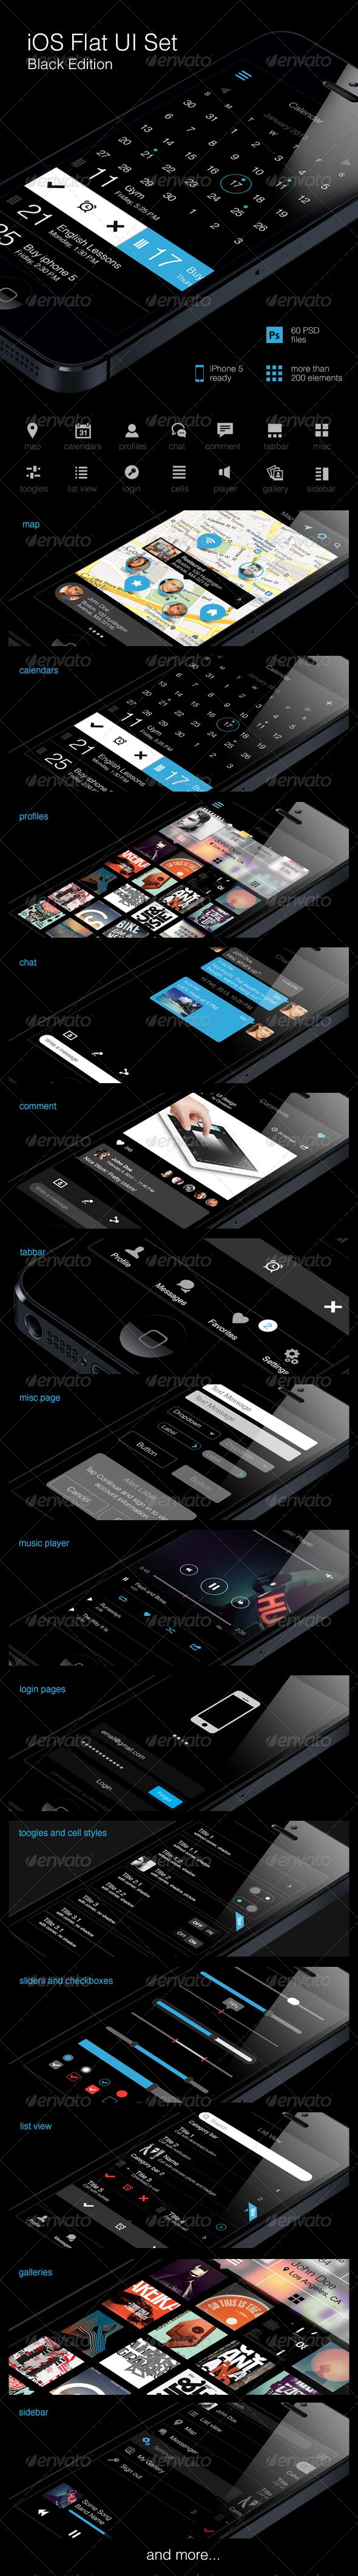 iOS Flat UI Set Black Edition - User Interfaces Web Elements